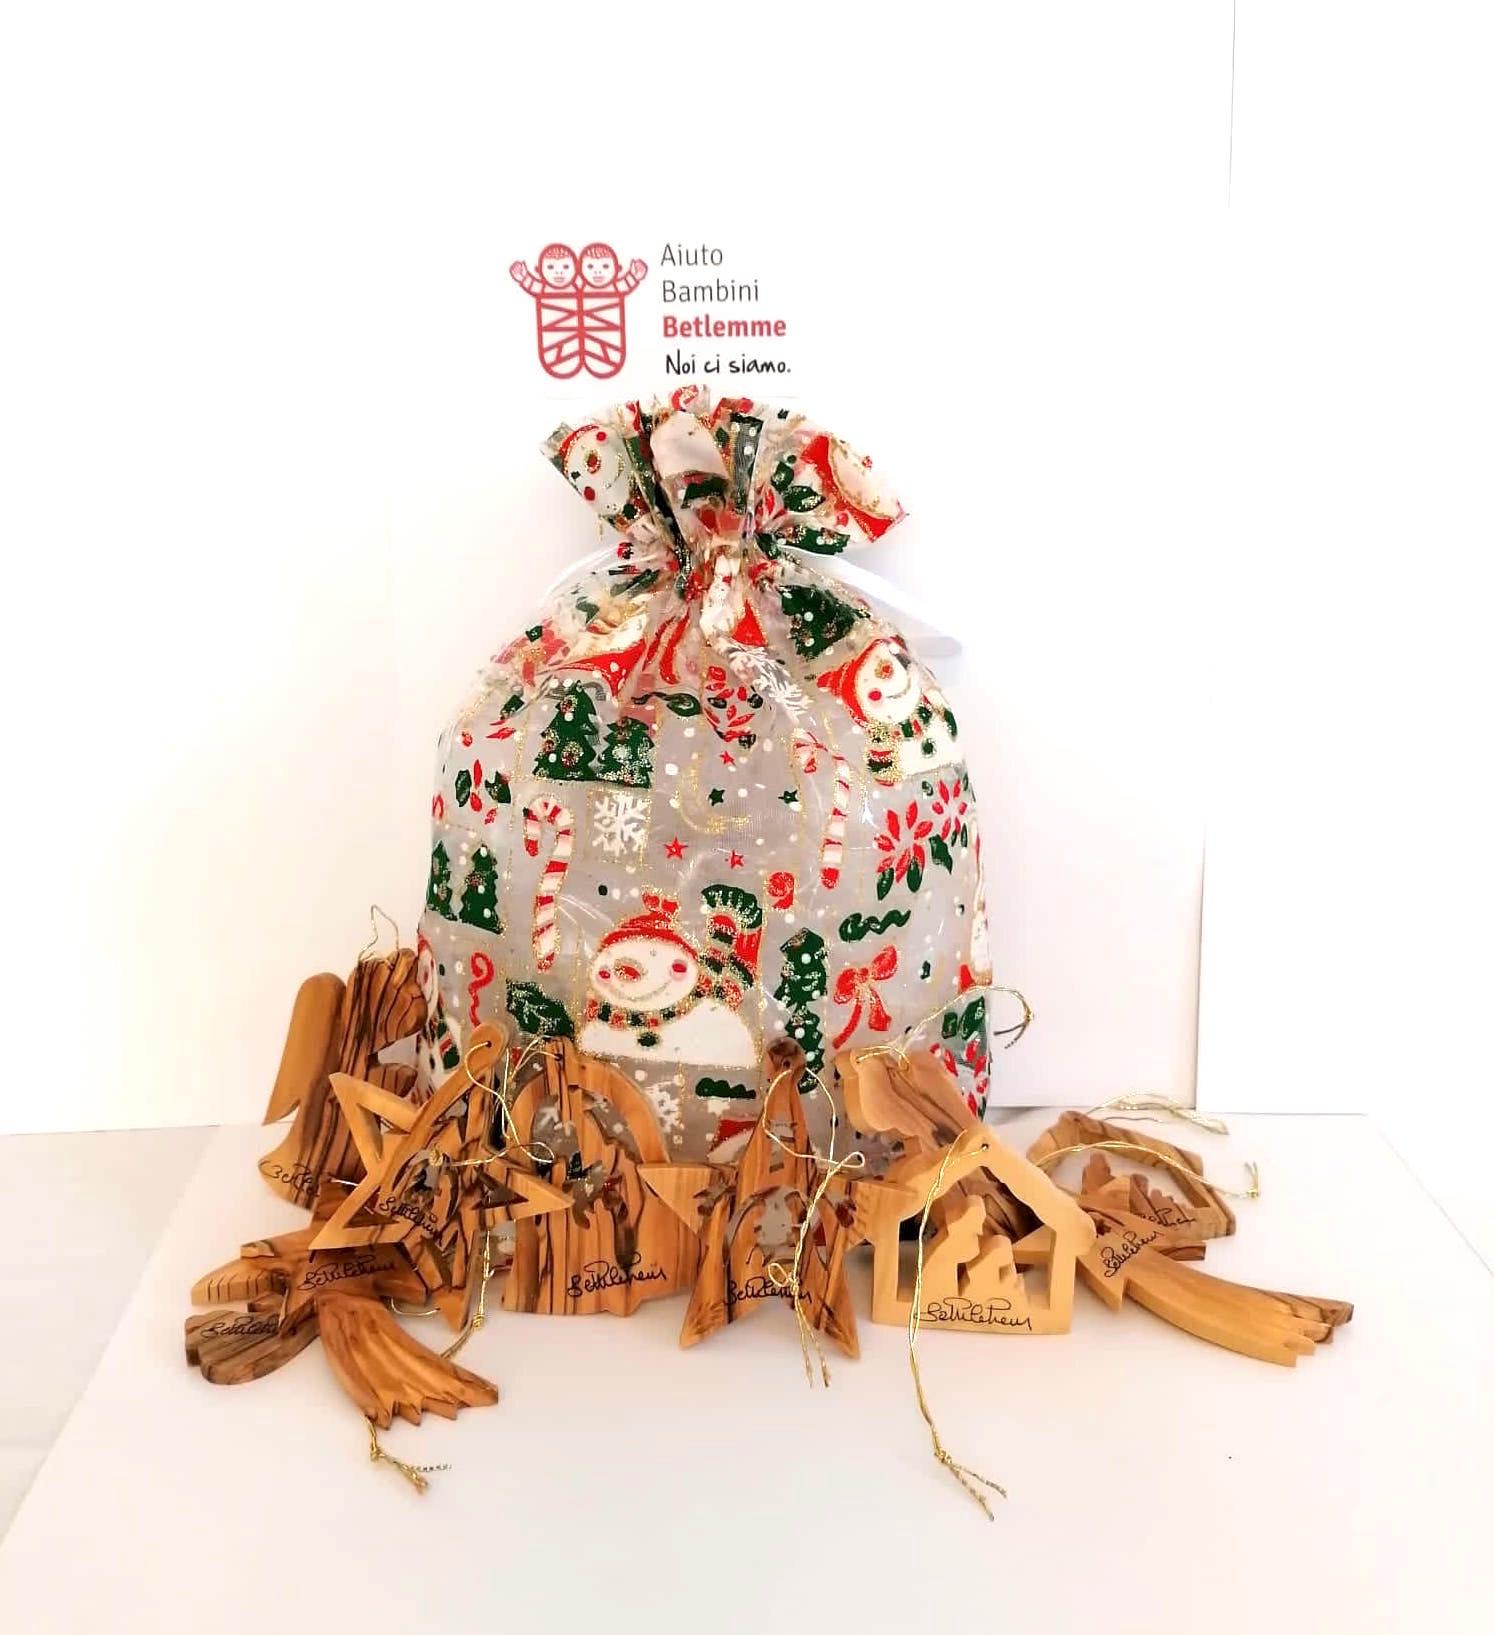 addobbi legno ulivo betlemme regali solidali terra santa palestina